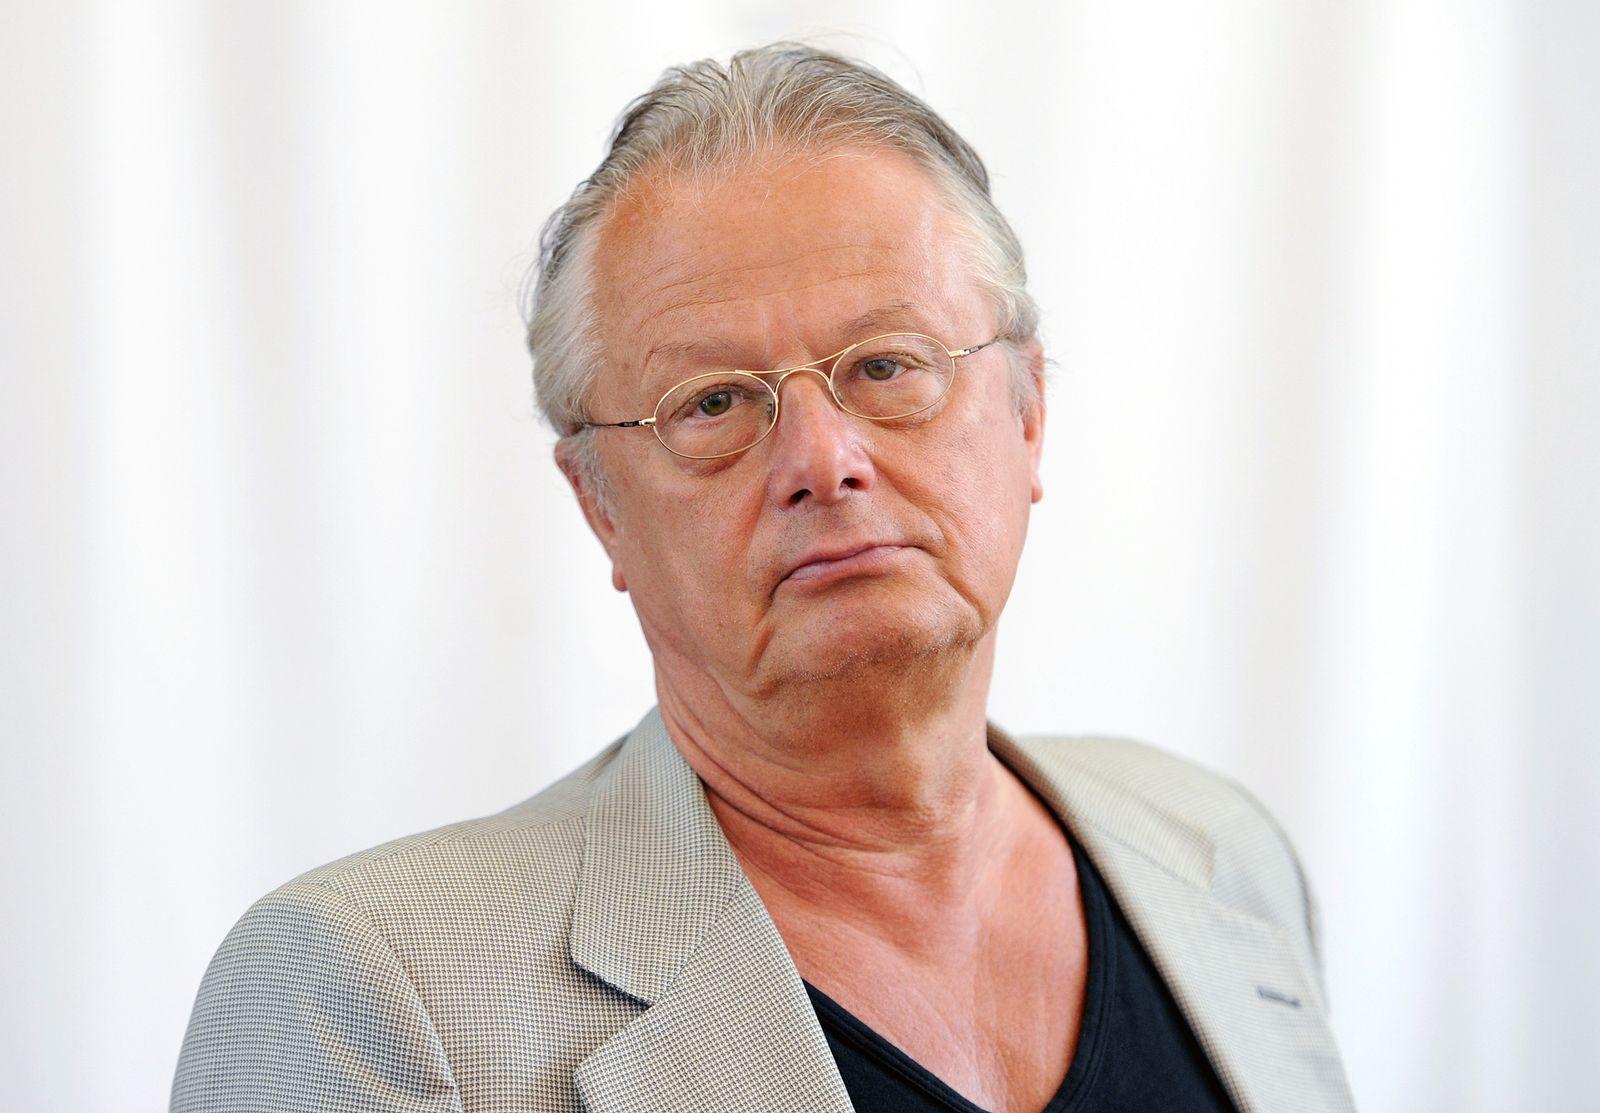 Theaterrückblick/ Frank Castorf